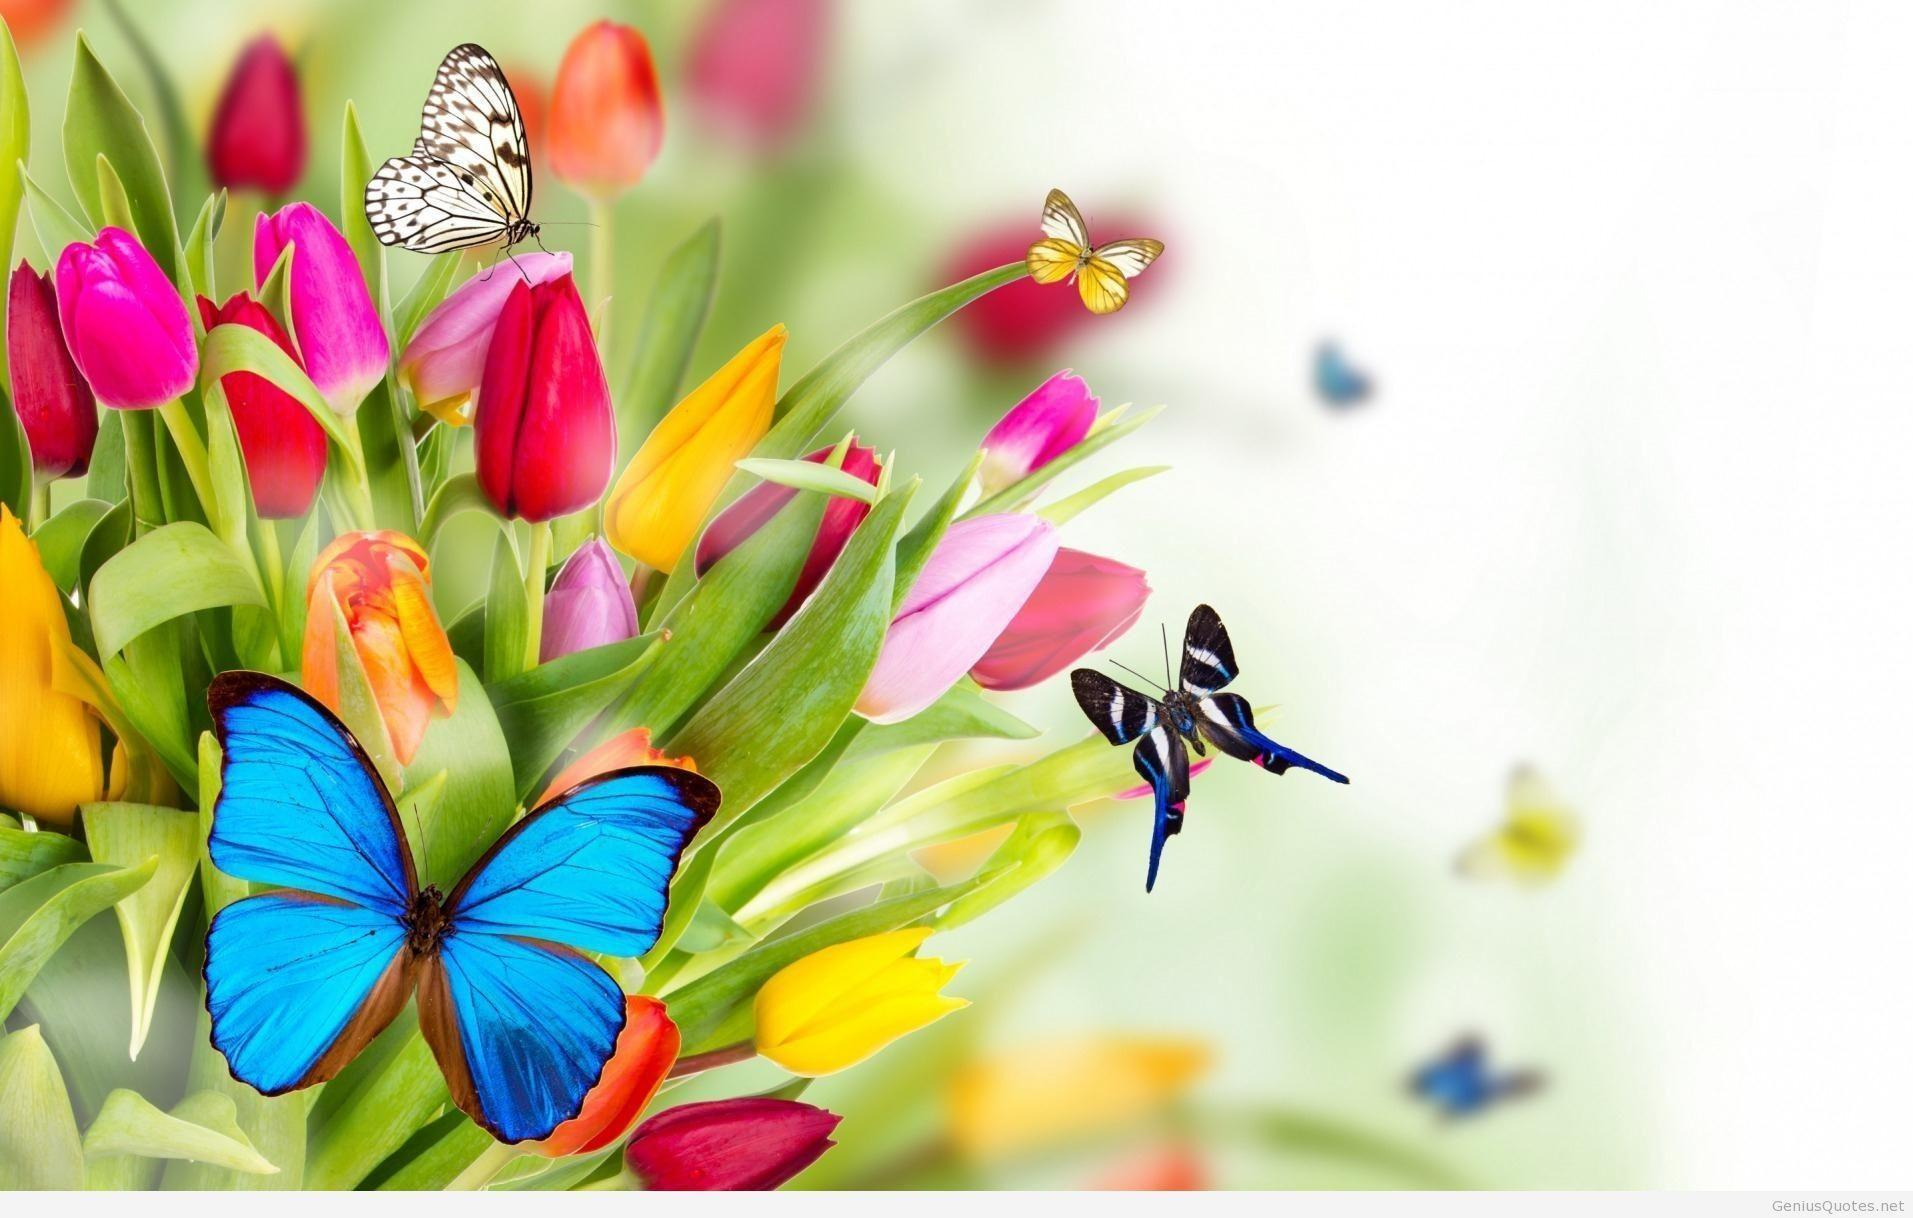 HD Spring Wallpaper